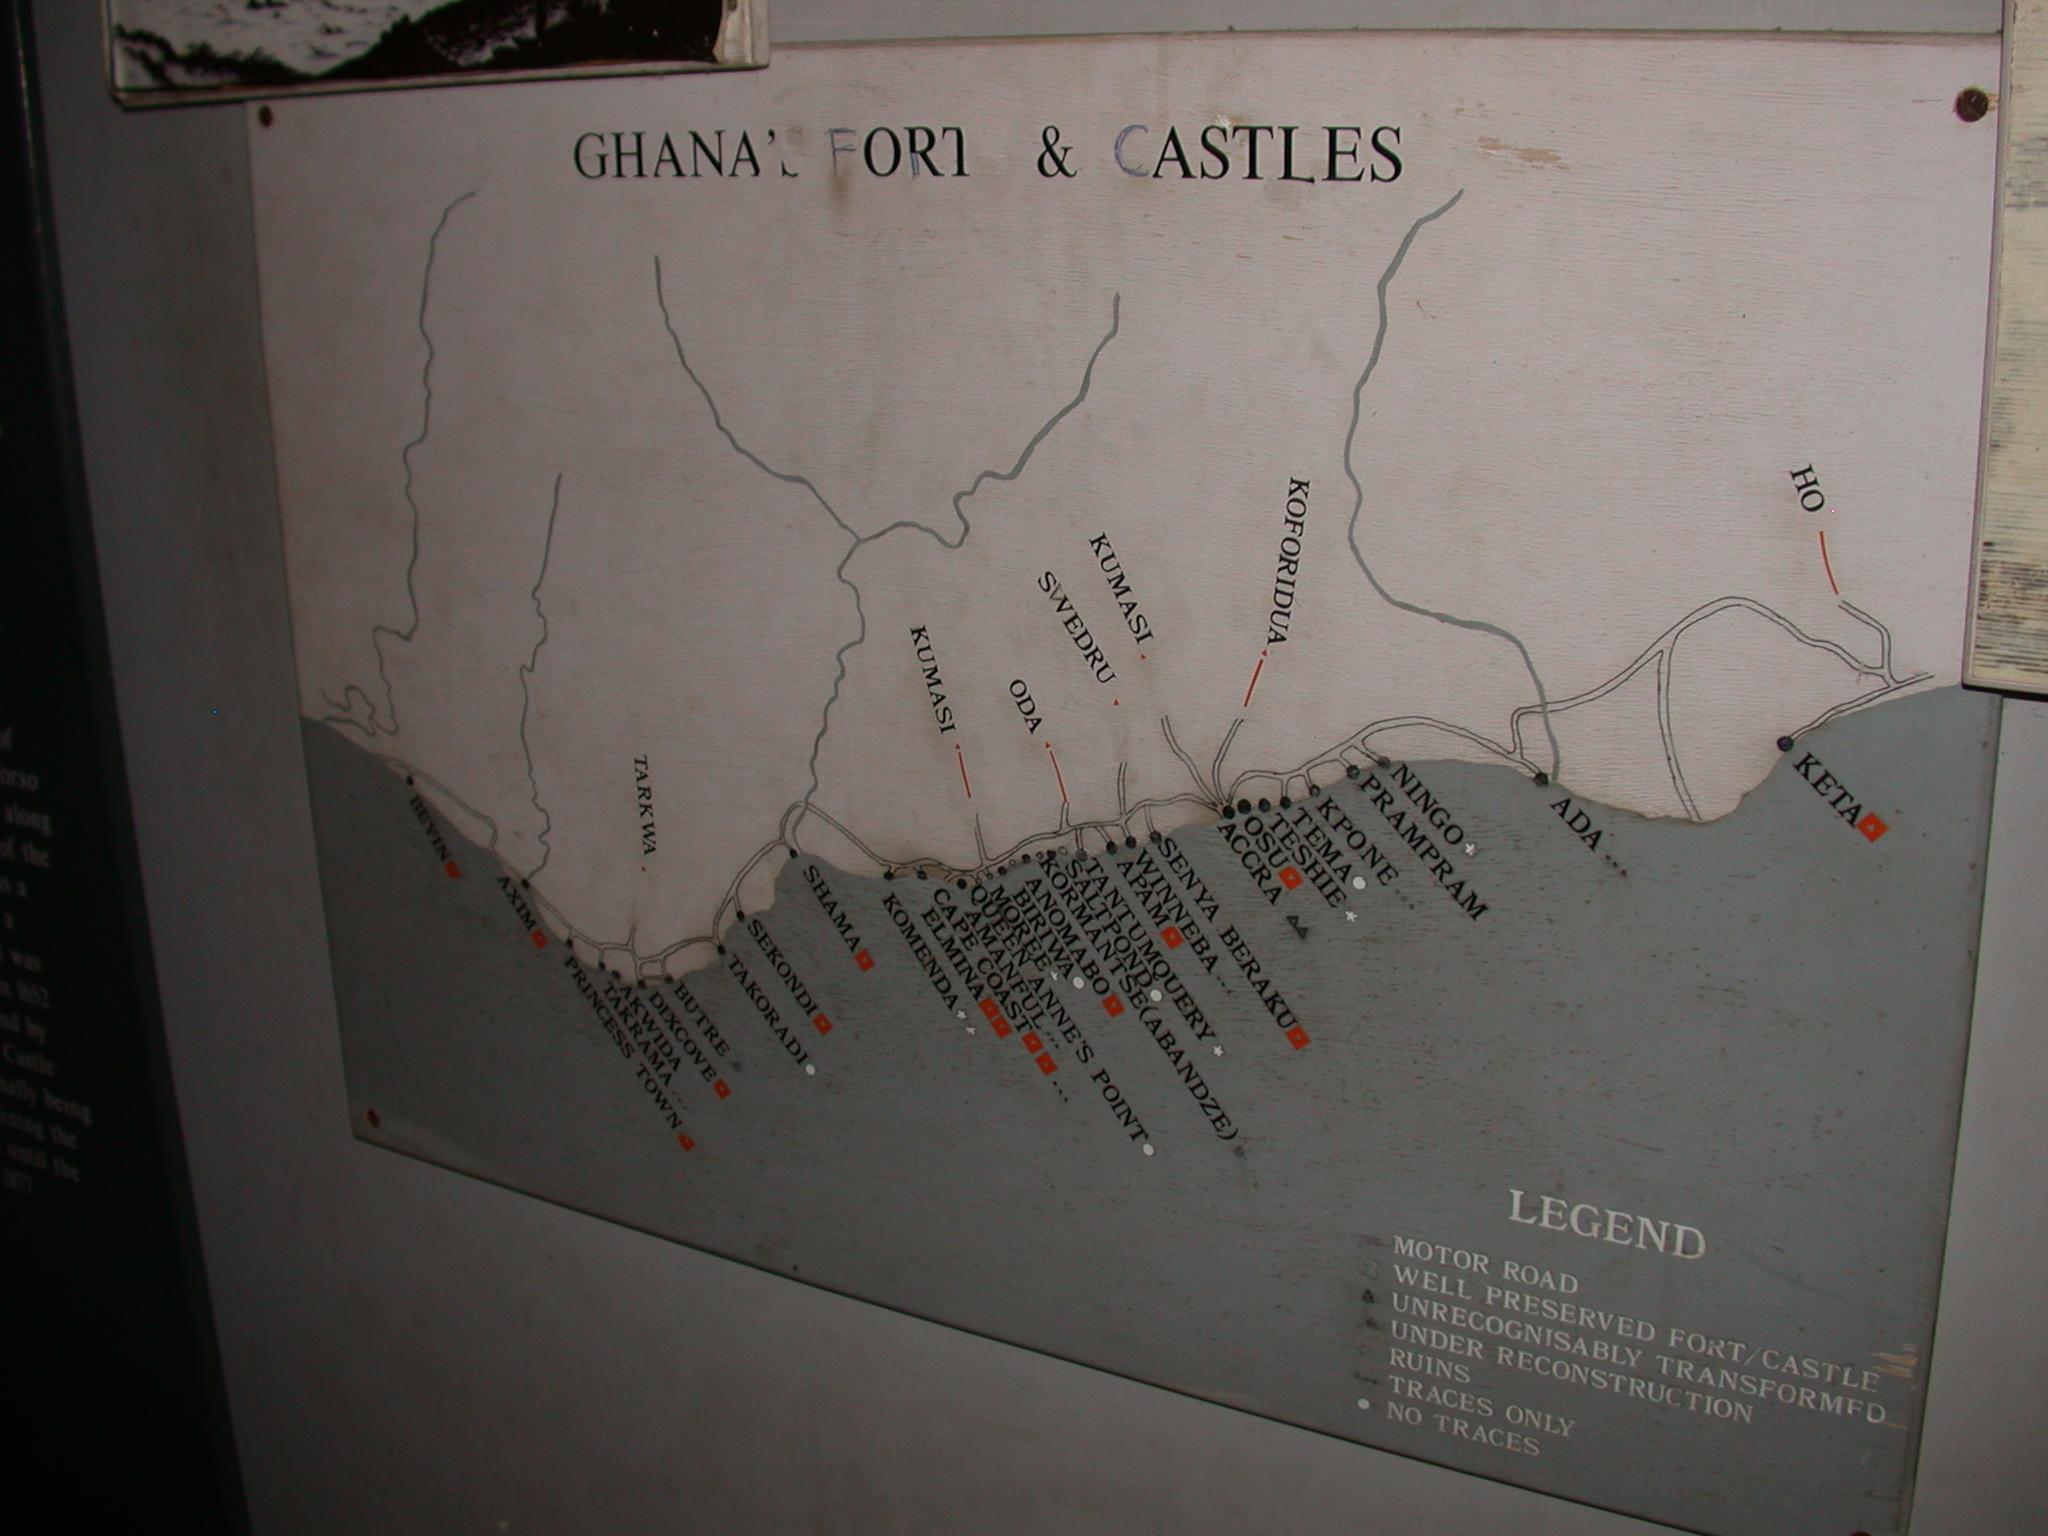 Ghana Forts and Castles Map, Cape Coast Slave Fort Museum, Cape Coast, Ghana